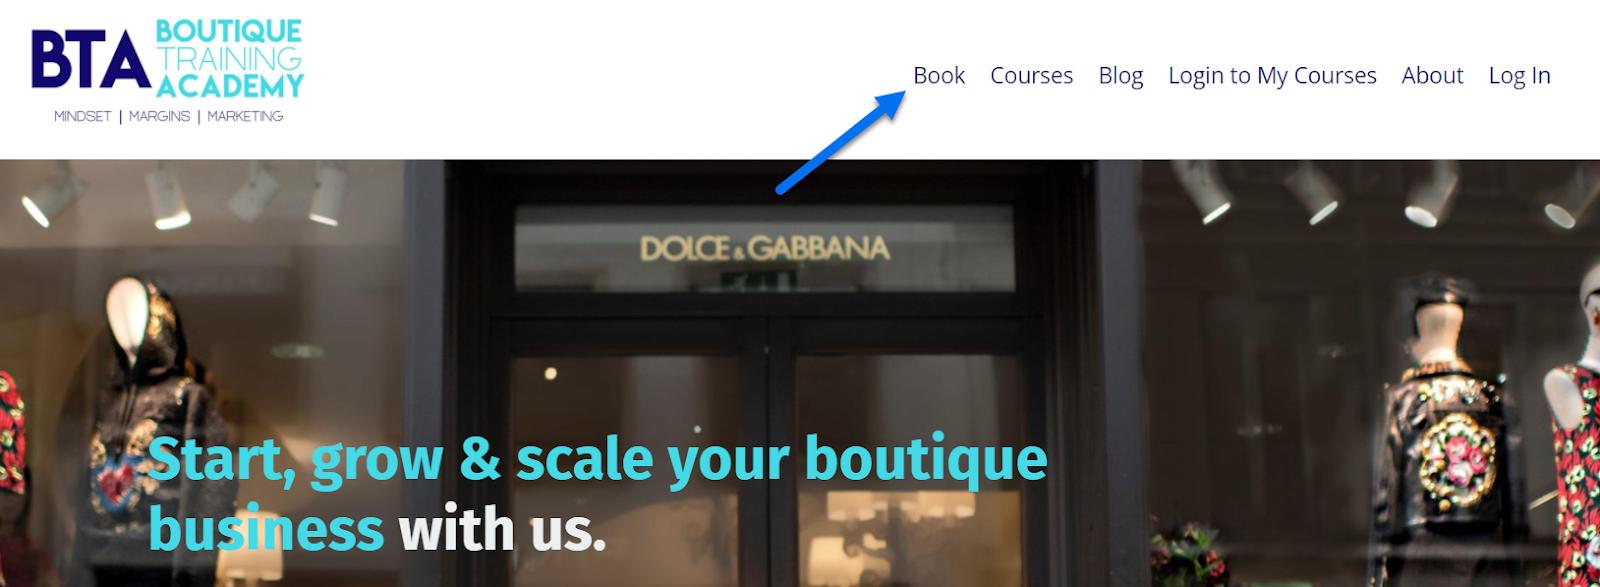 Screenshot of the Boutique Training Academy website